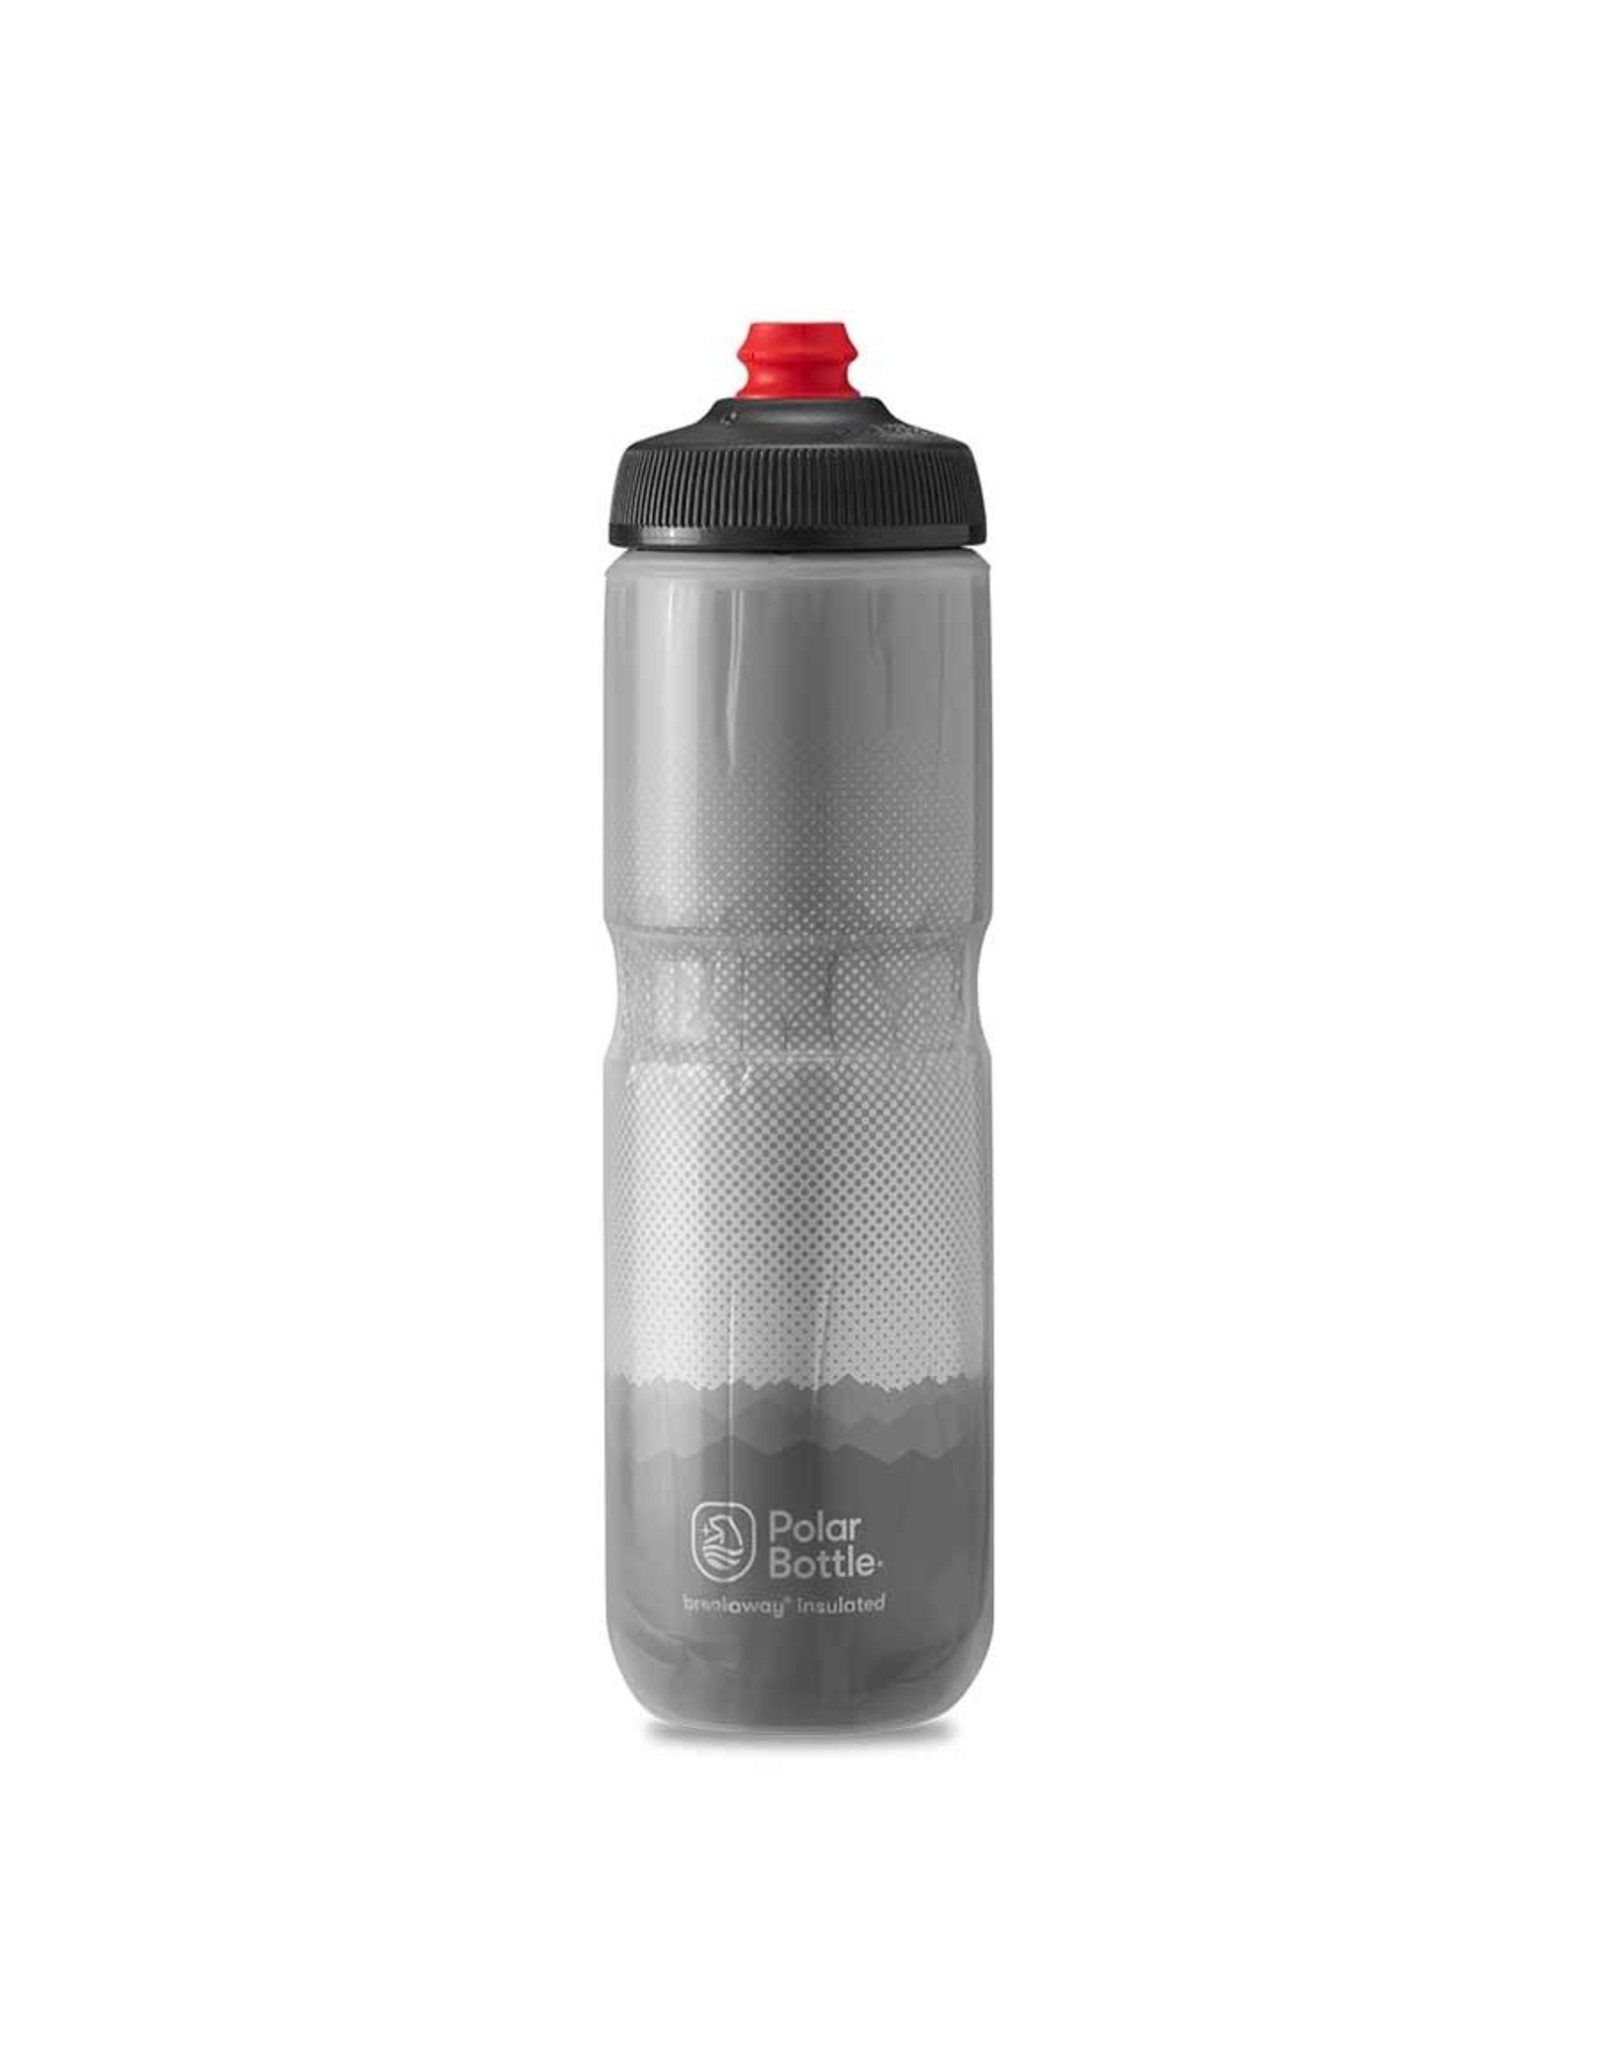 Polar Bottle Polar - Breakaway Insulated 24oz, Water Bottle, 710ml / 24oz, Charcoal/Silver